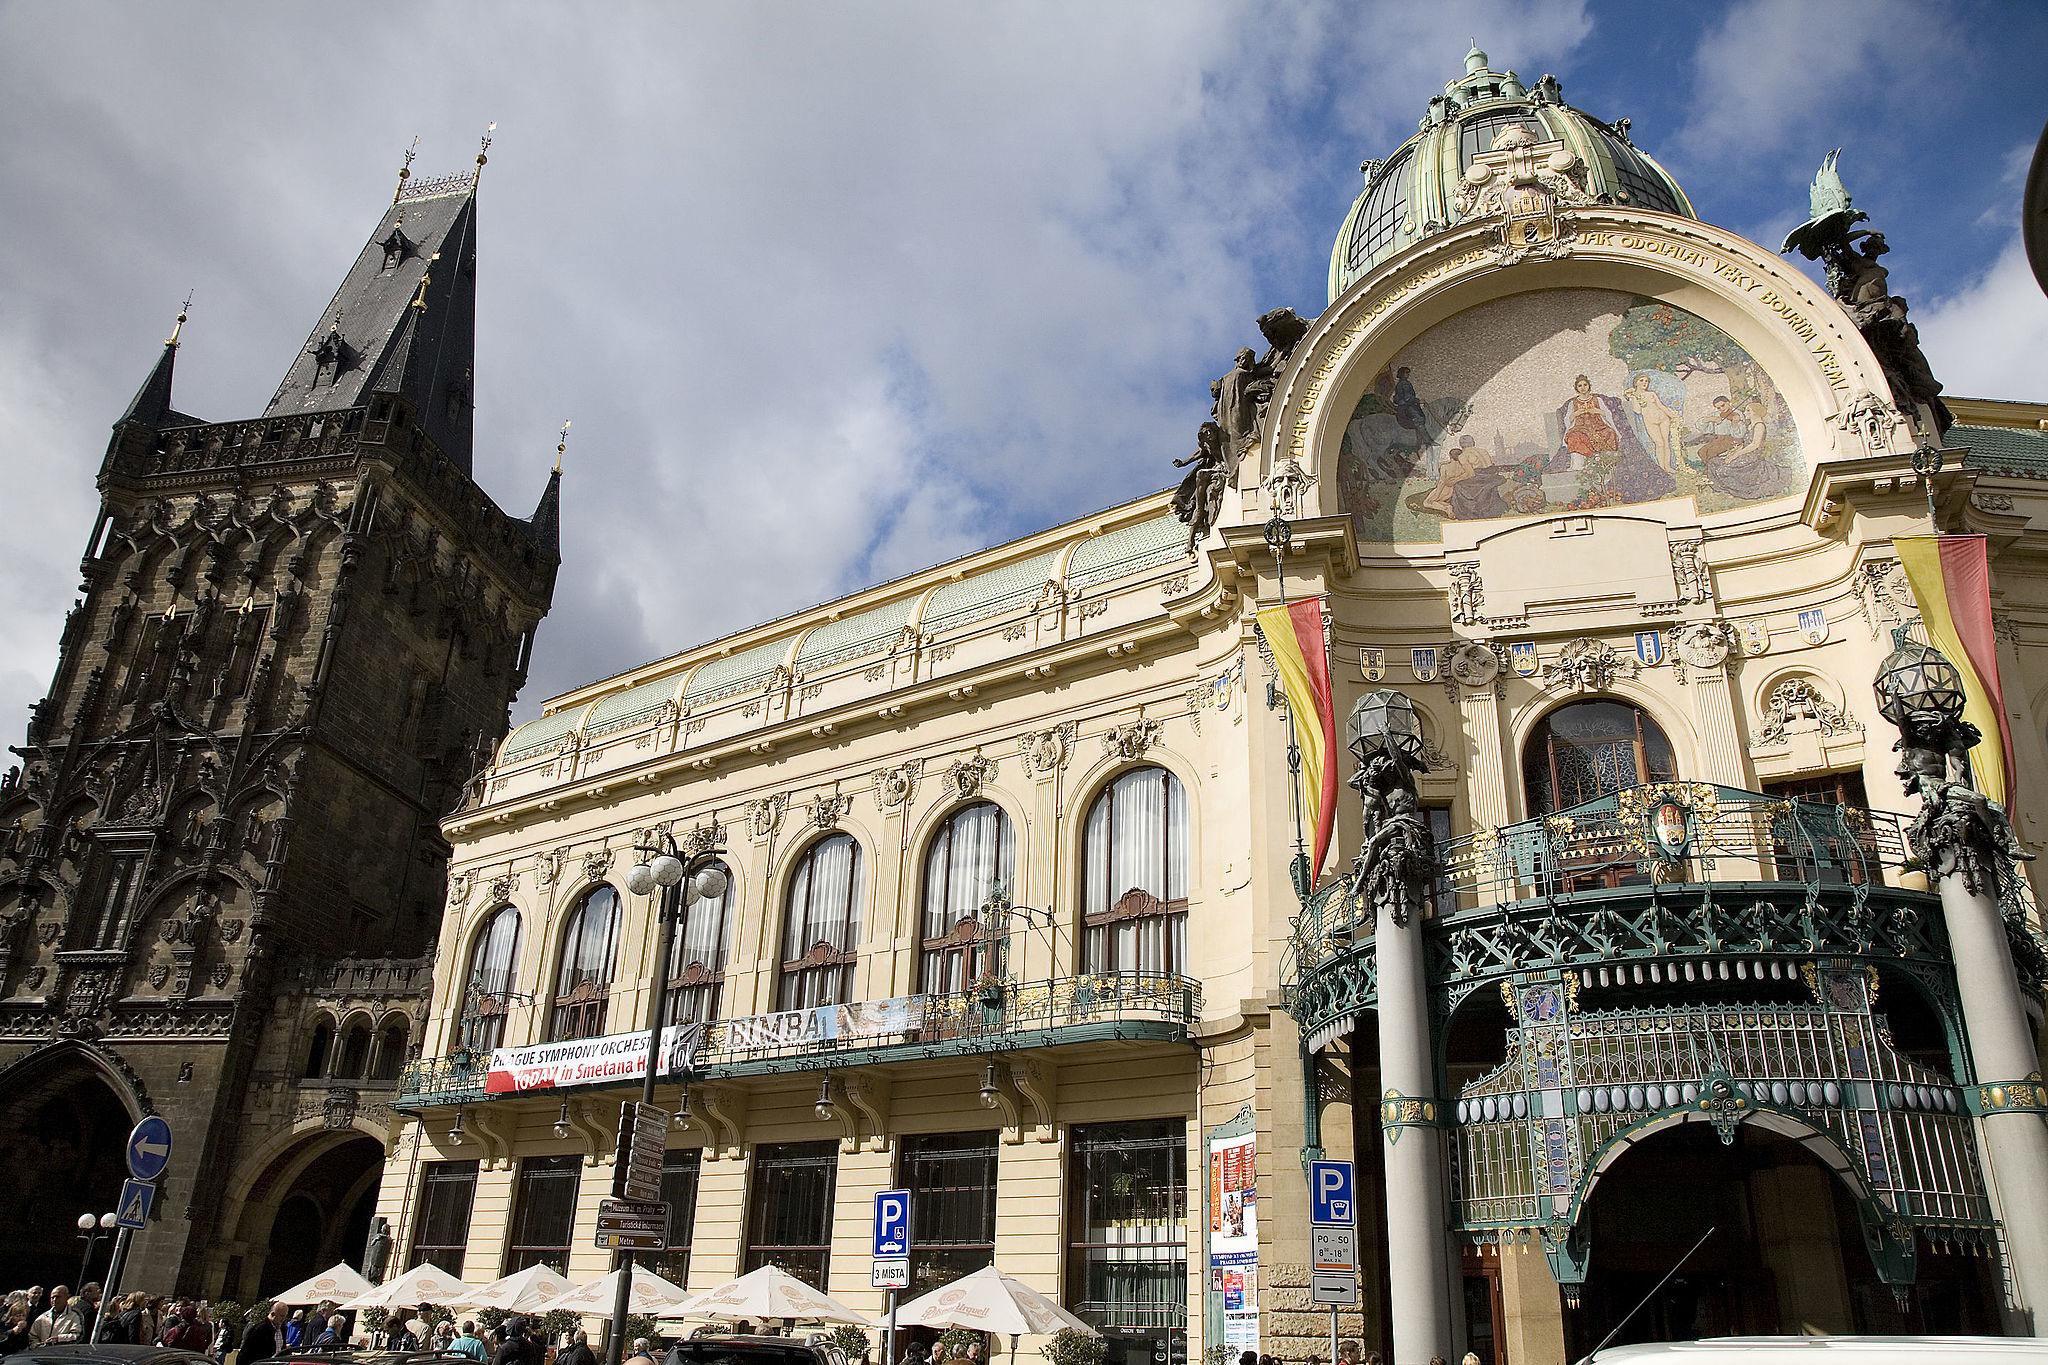 Obecni Dum Praga